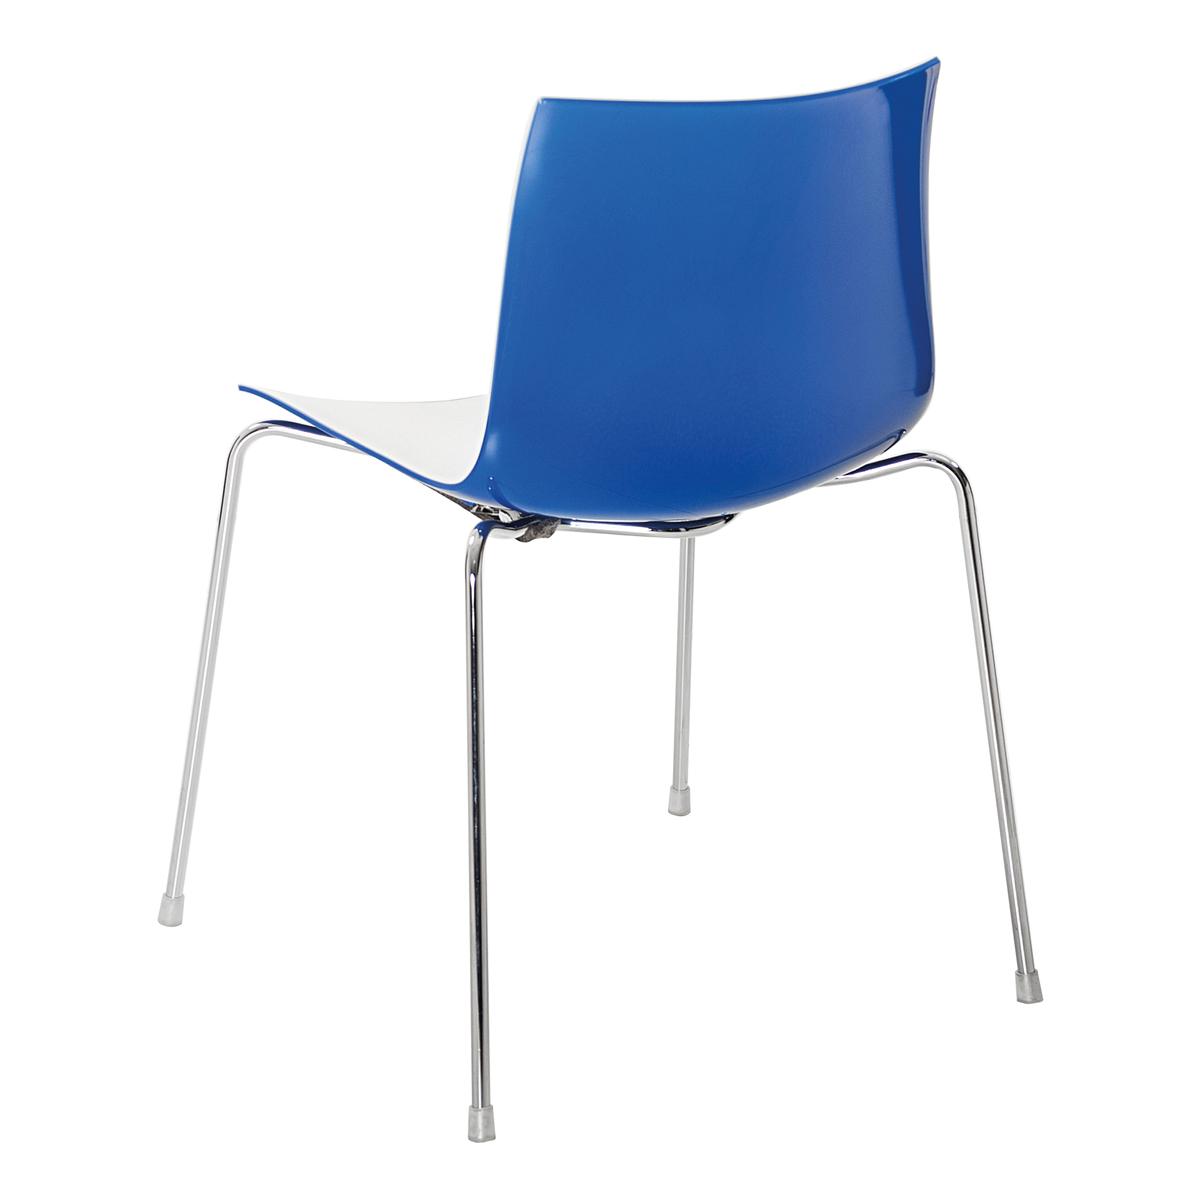 Stuhl Catifa 46, 4-Fuß, weiß-blau